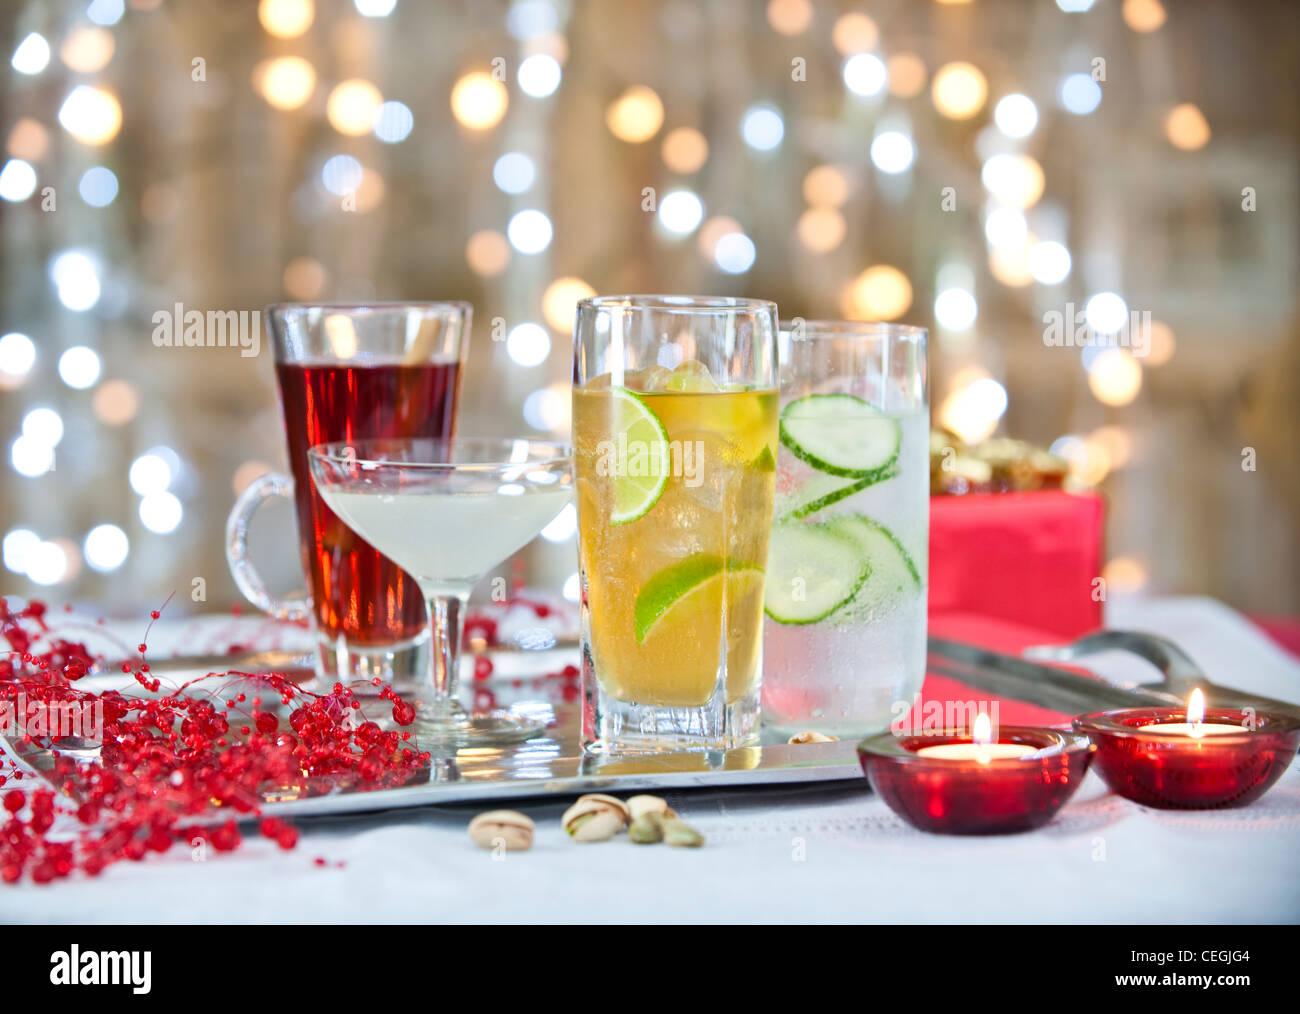 Natale cocktail bevande 2 Immagini Stock